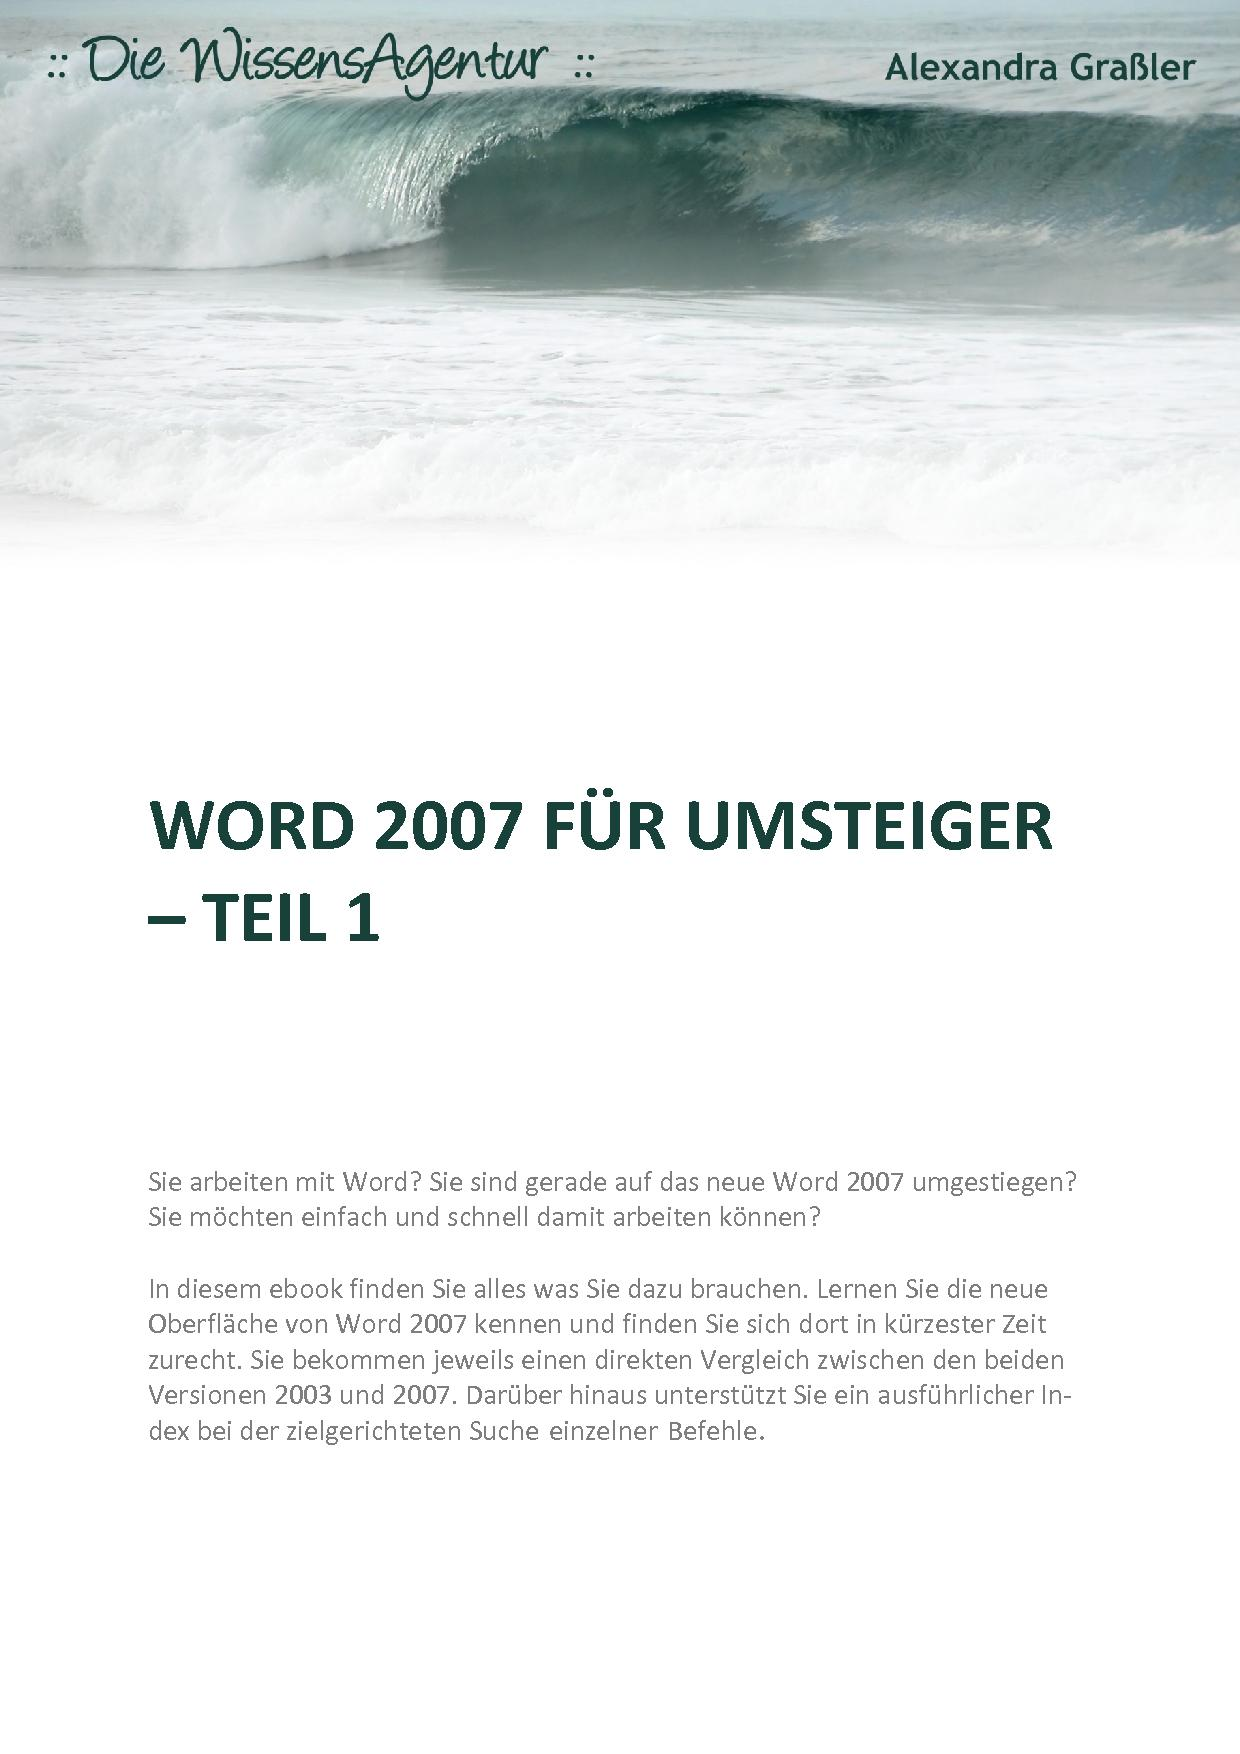 word-2007-titel.jpg